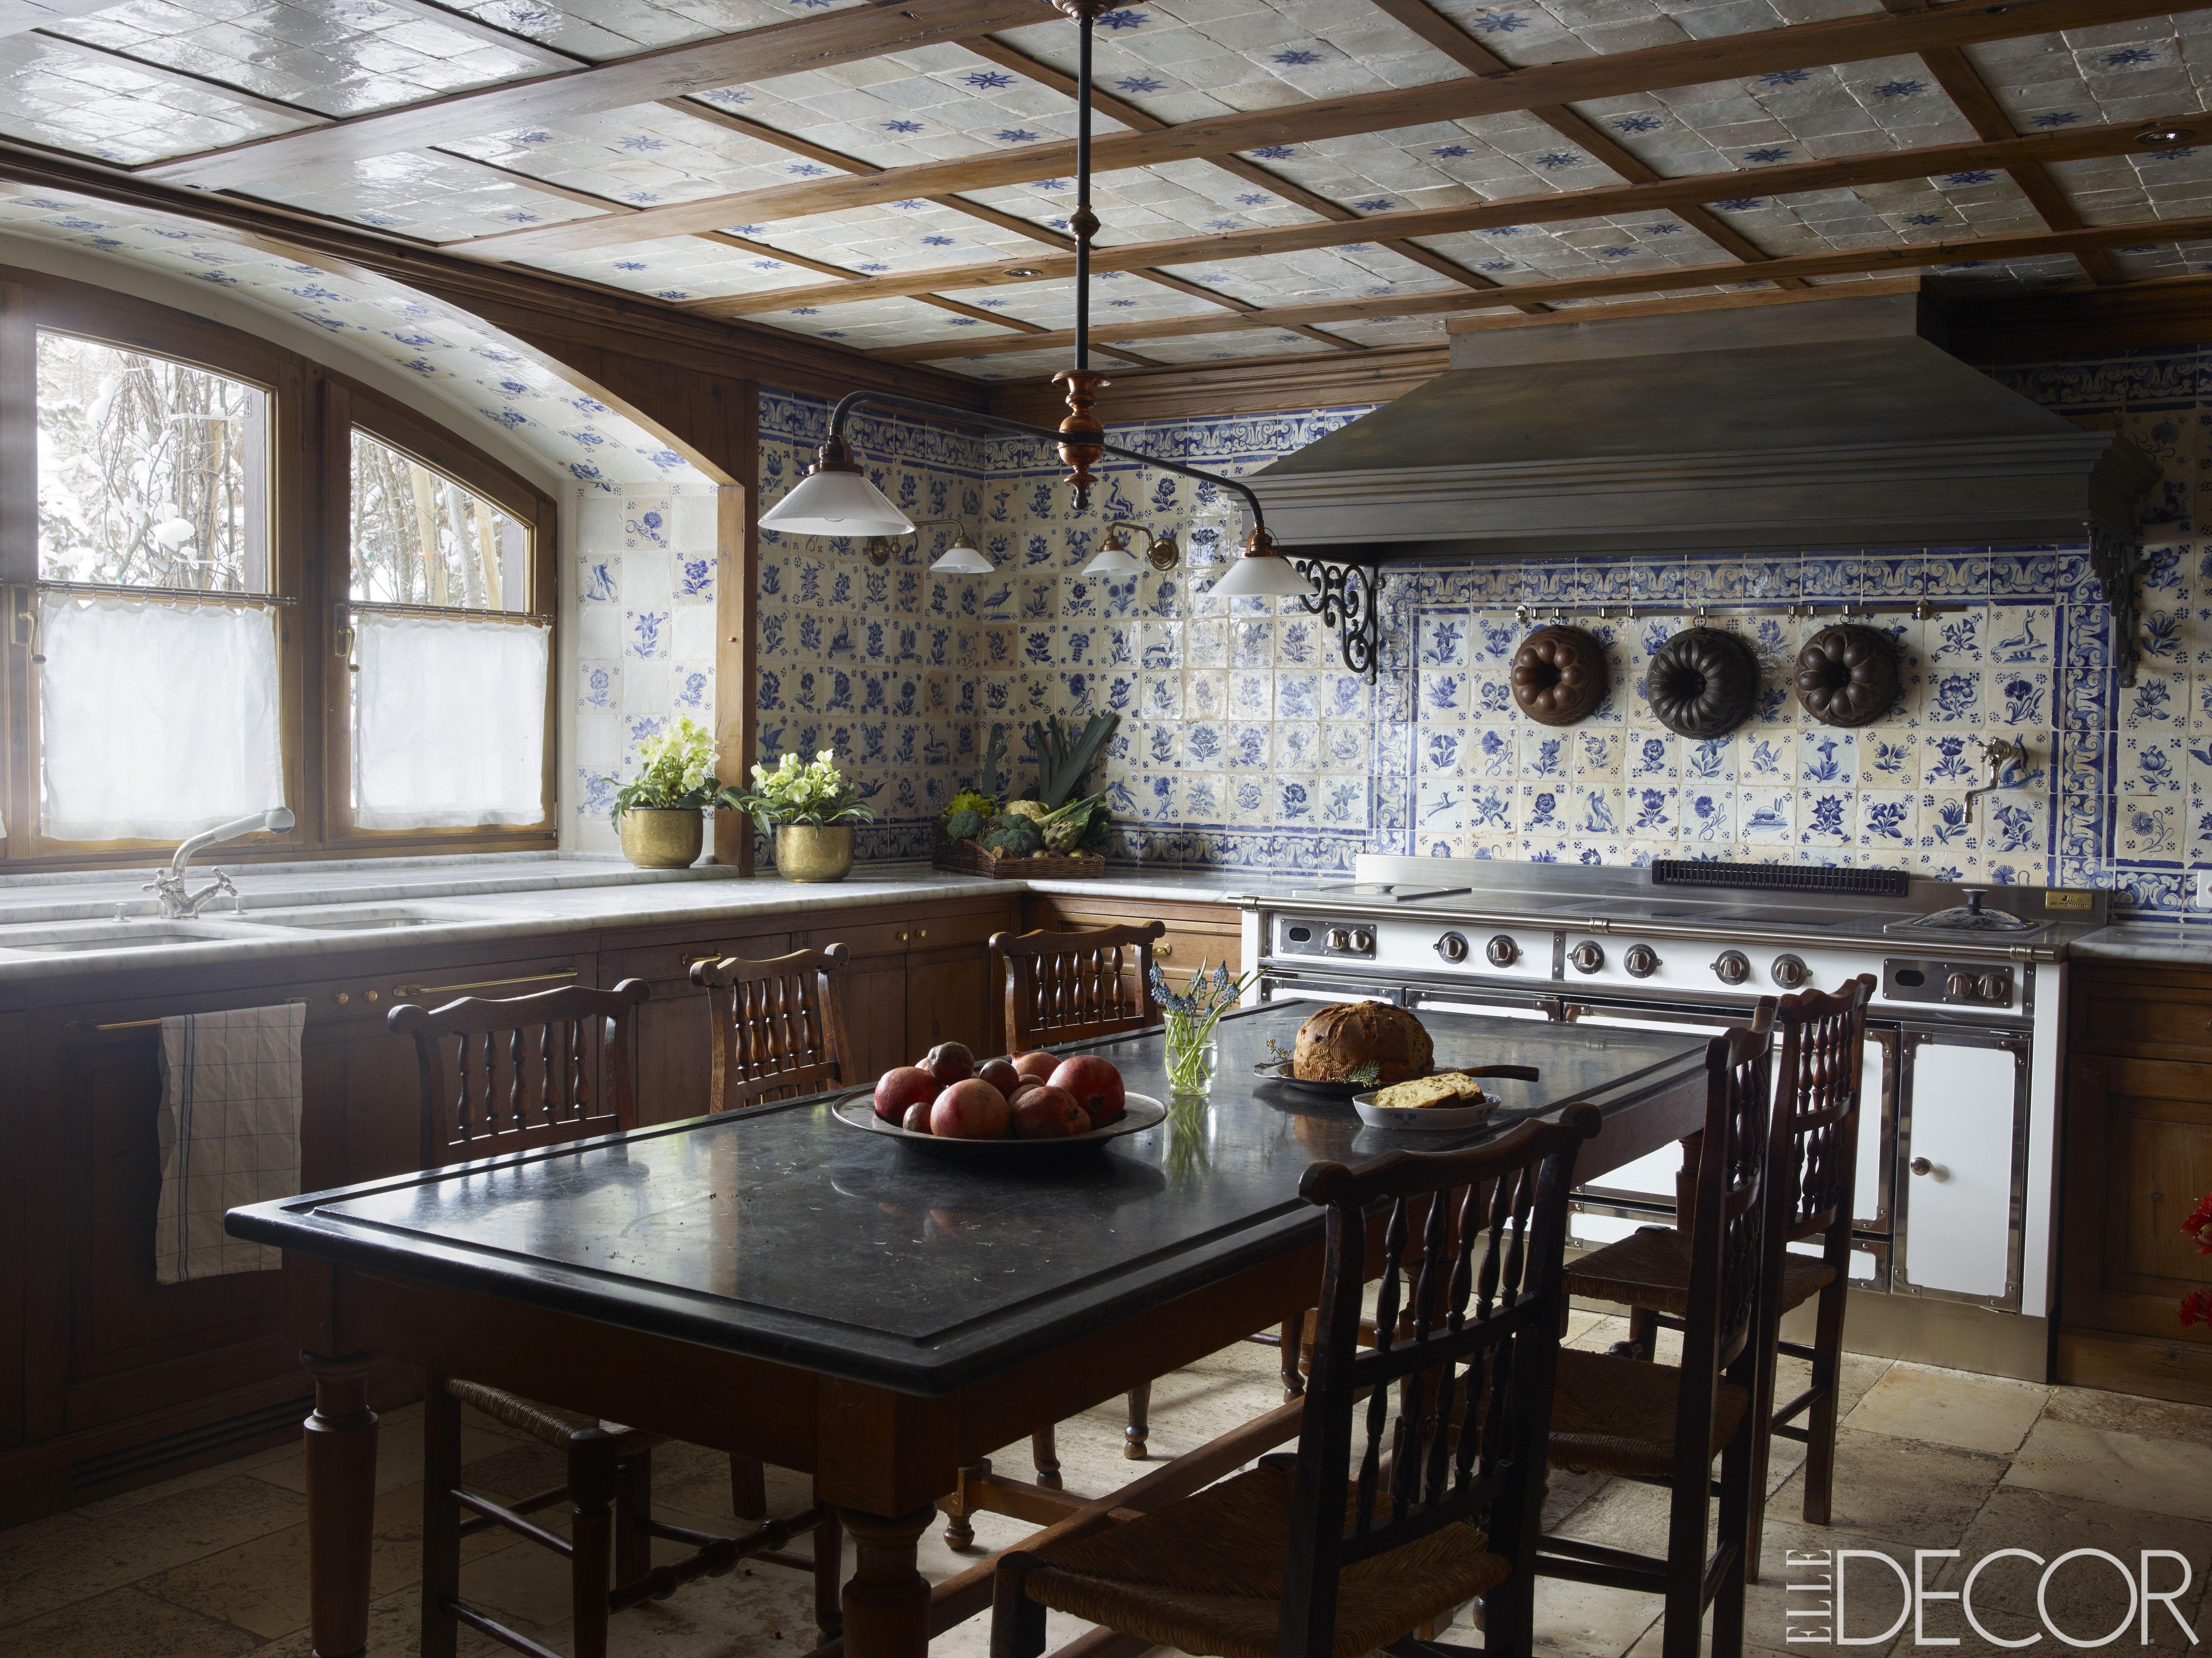 25 rustic kitchen decor ideas country kitchens design rh elledecor com